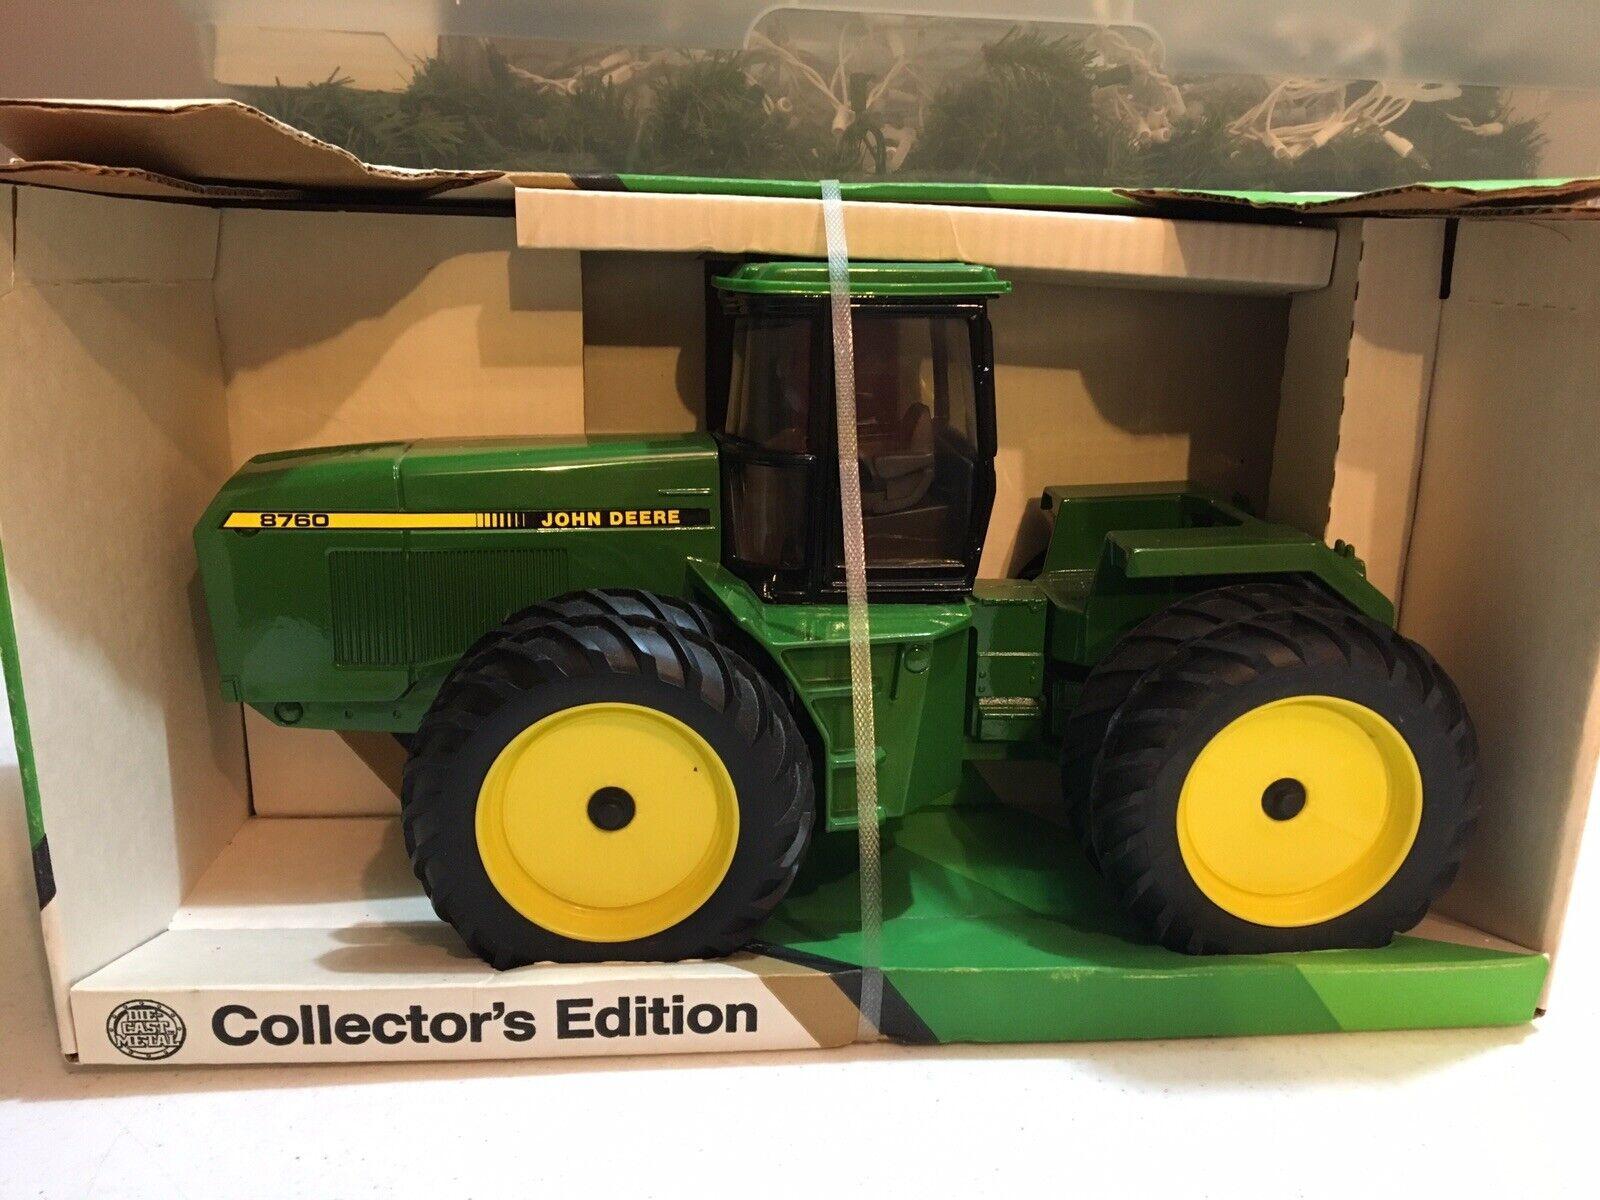 4-Wheel Drive Tractor 1 16 Scale ERTL John Deere - Stock  5595